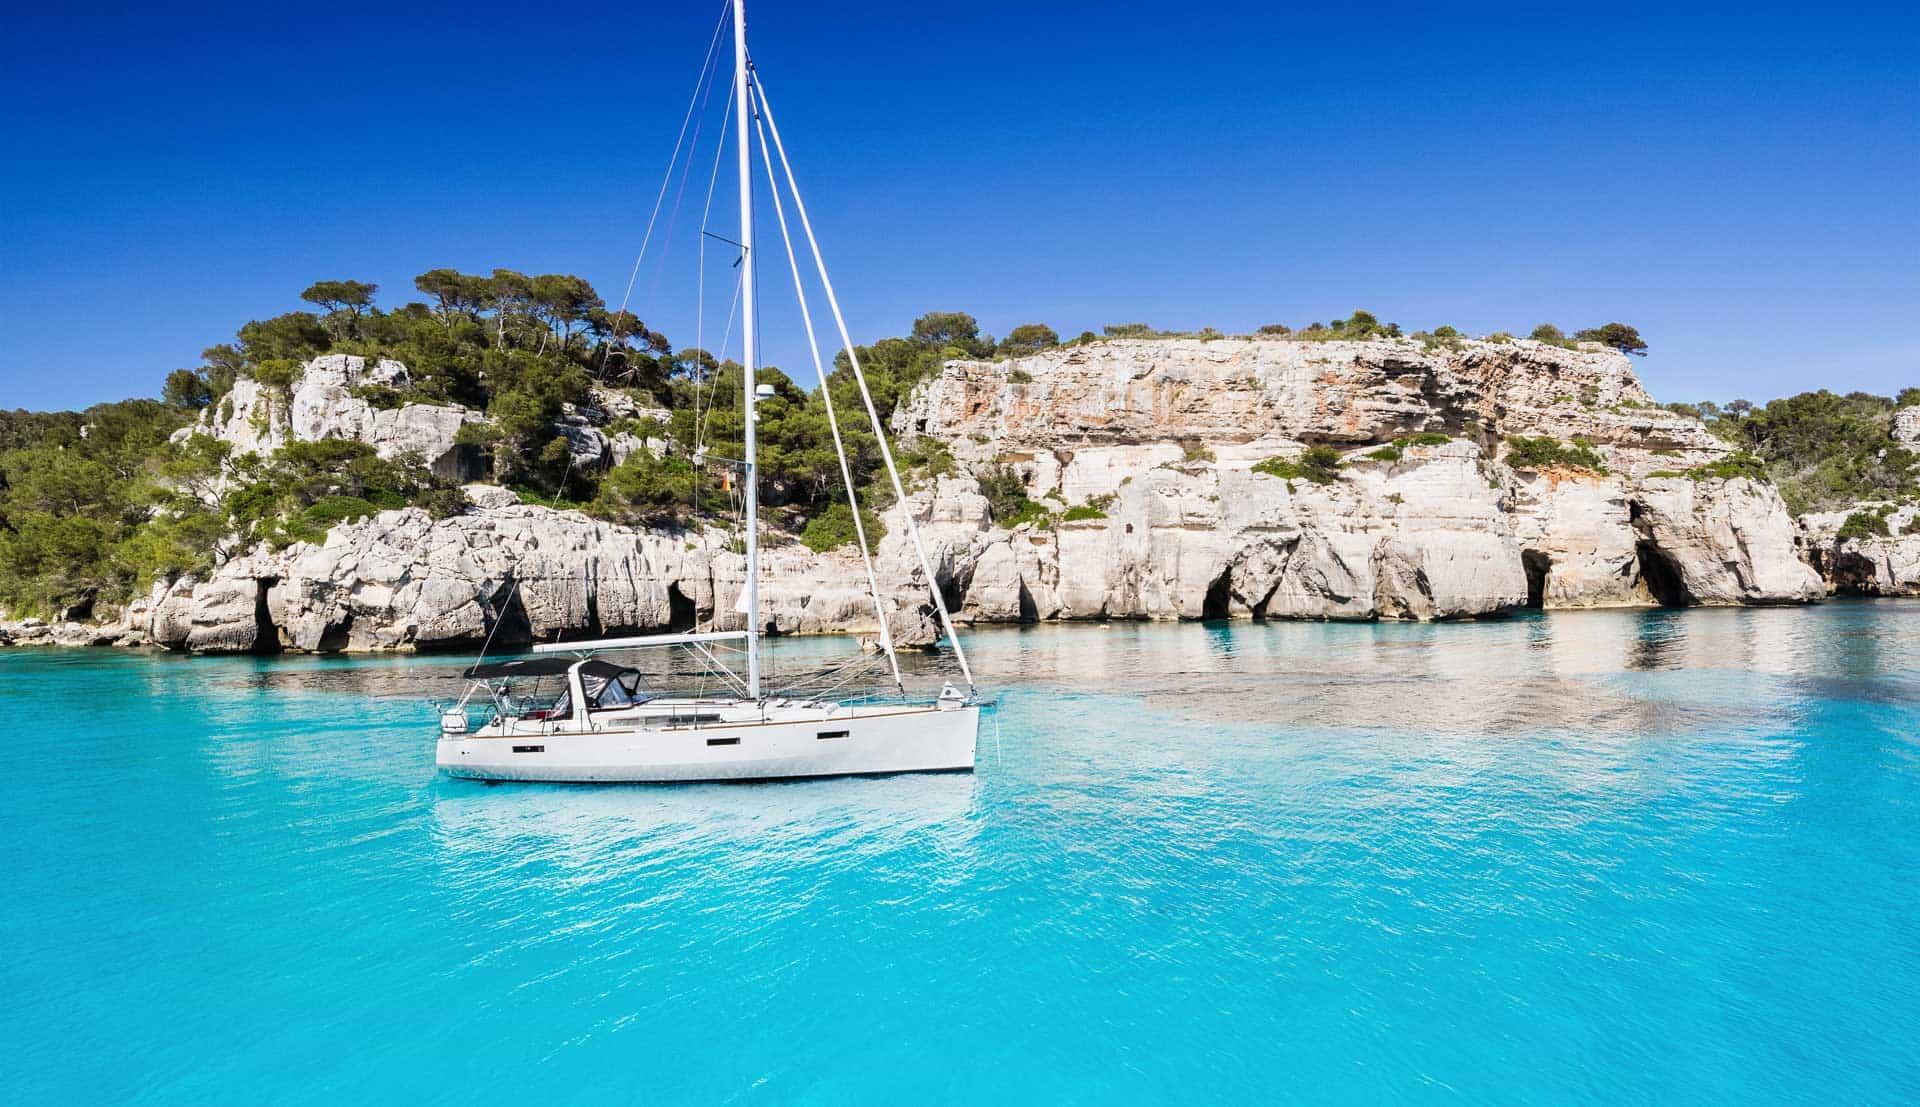 Sailing_Ionian_Lefkada_Greece_Sail2day